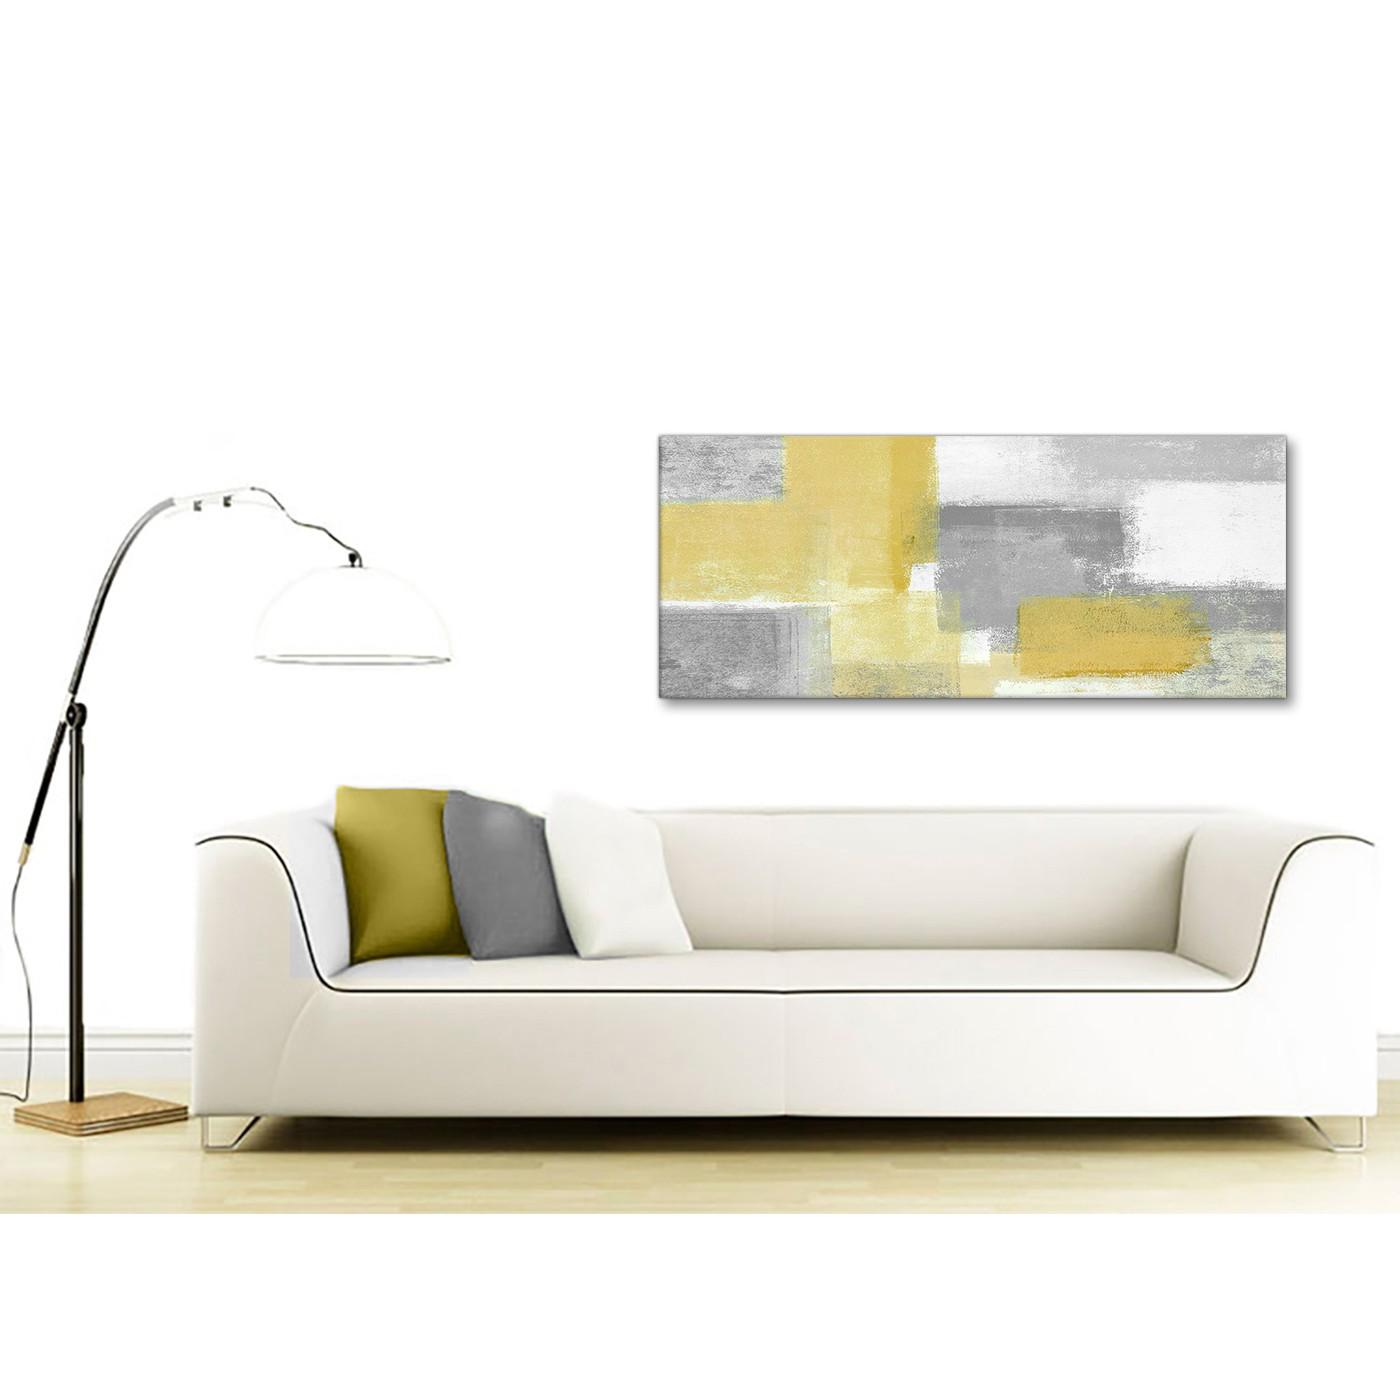 High Quality Display Gallery Item 4